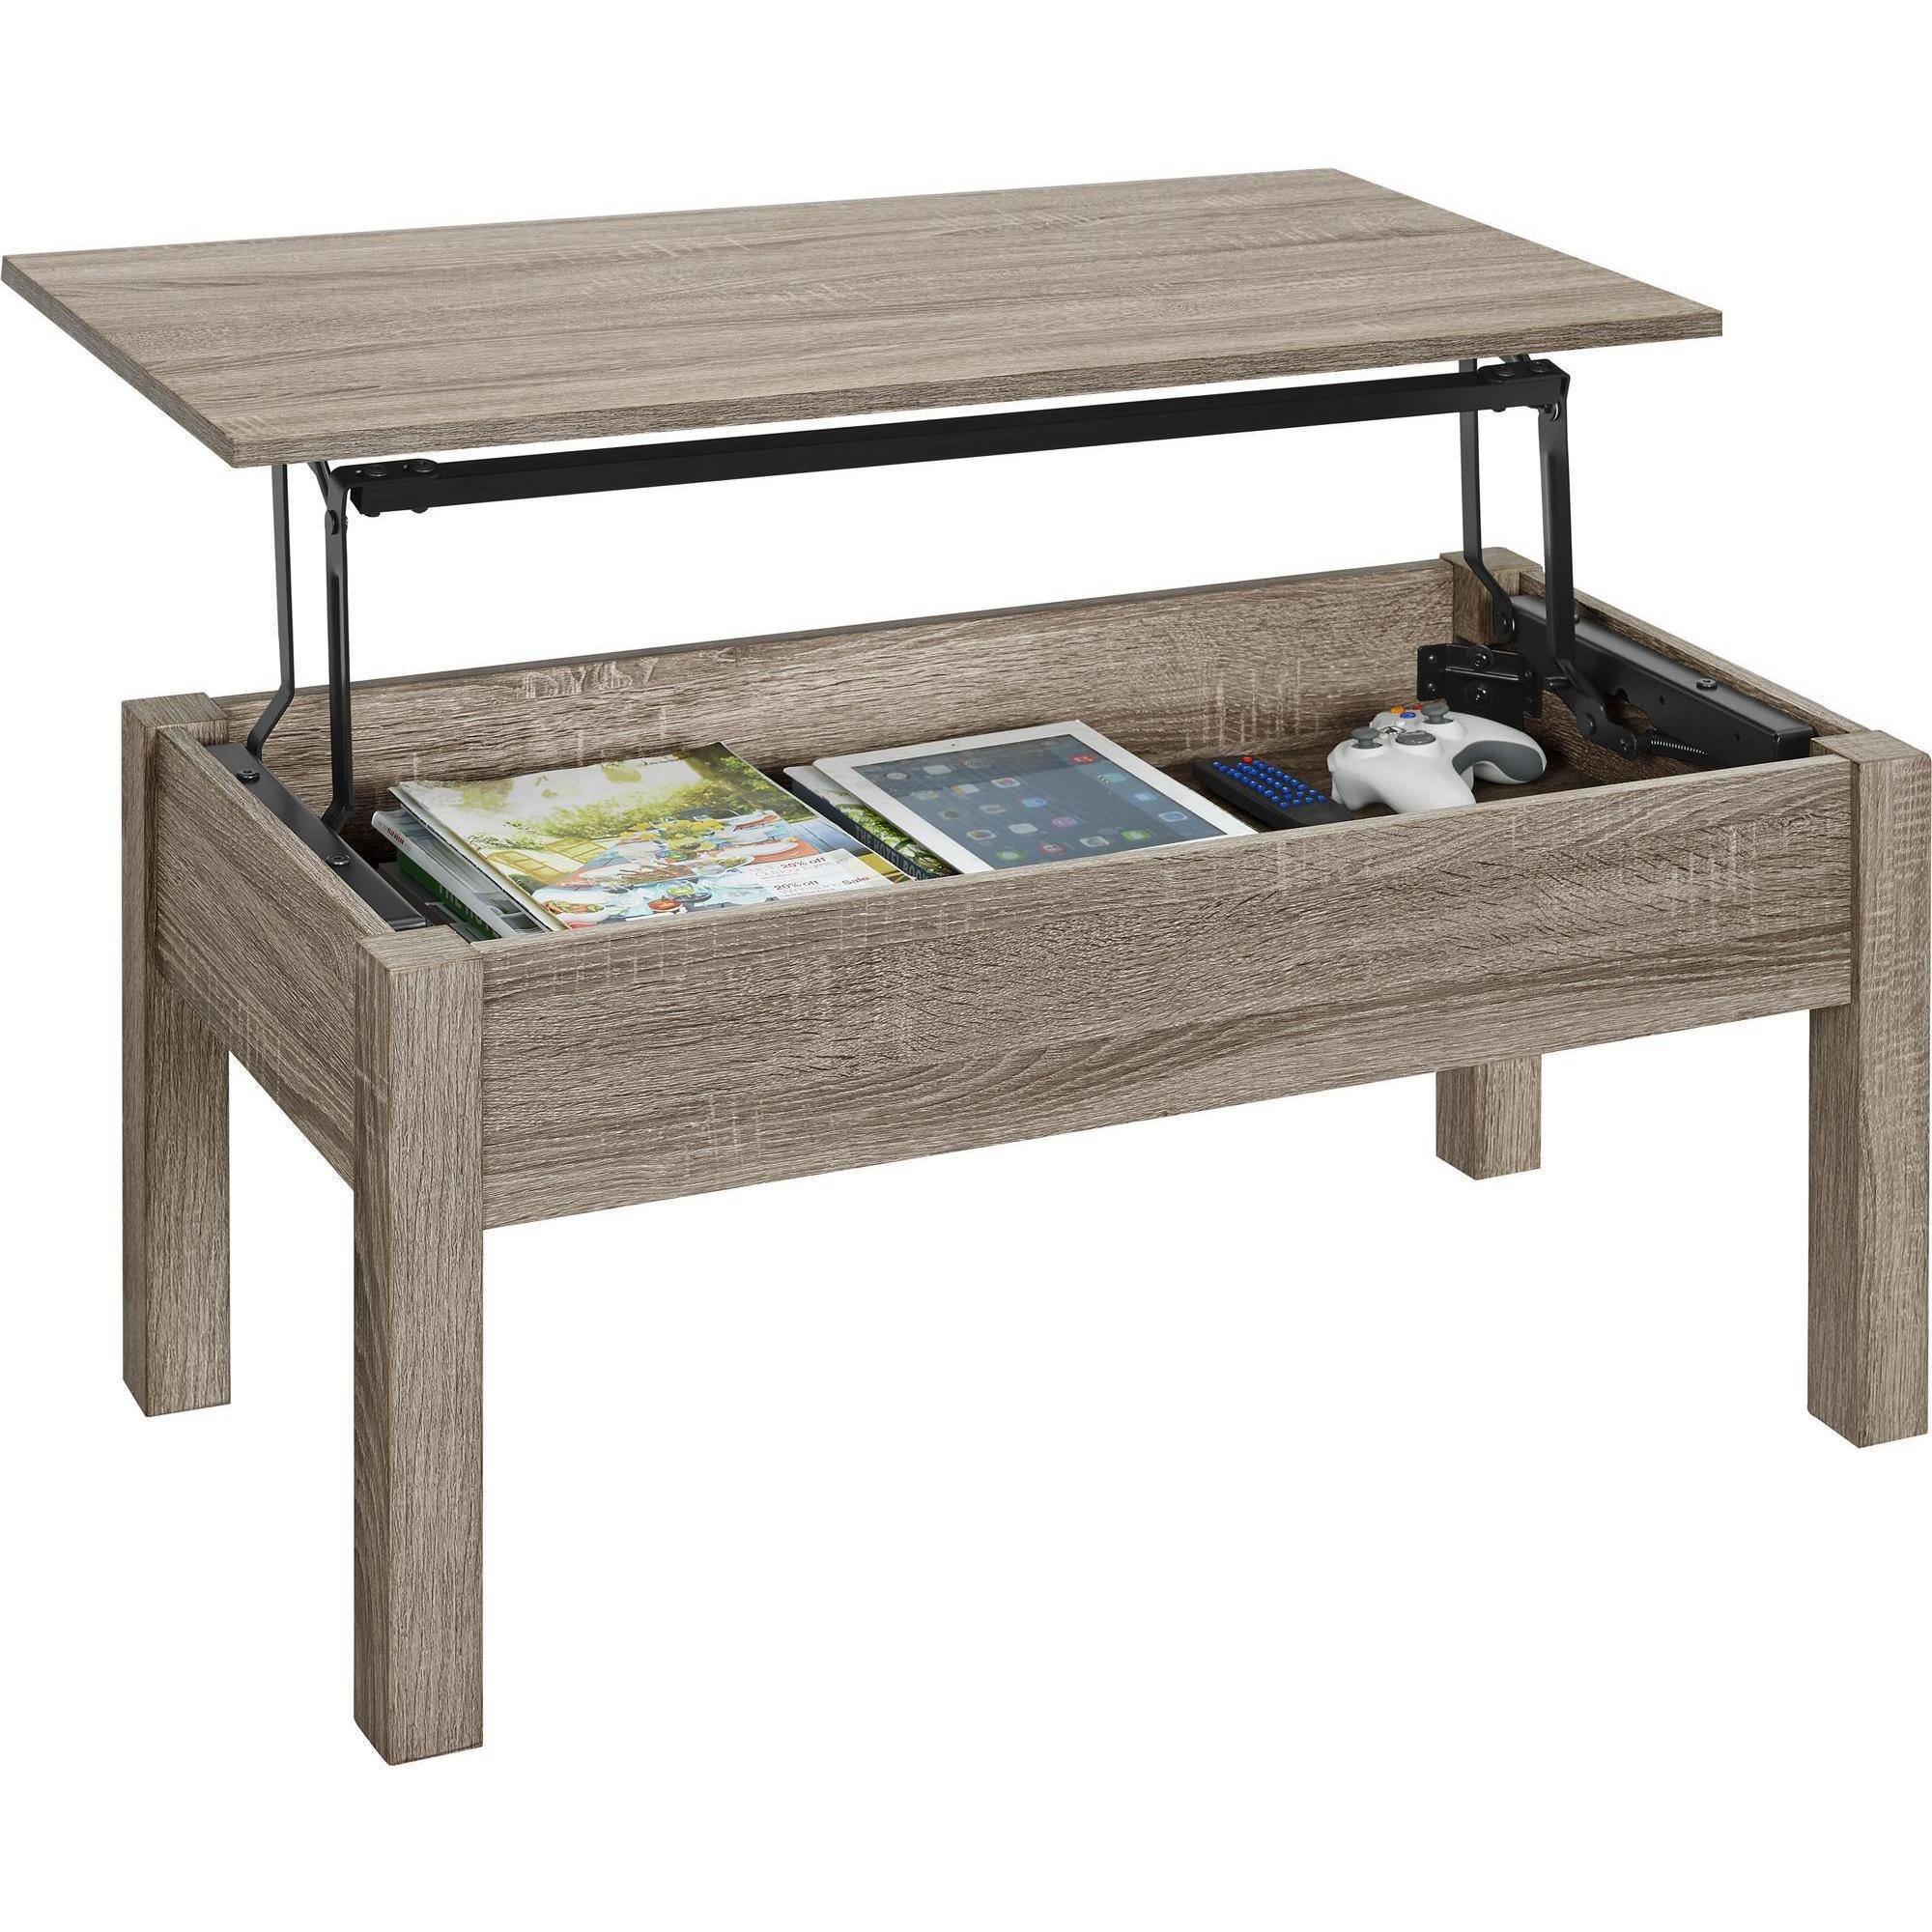 Gracelove Wood Lift-Top Coffee Table Computer book desk, Multiple Colors (Sonoma Oak)